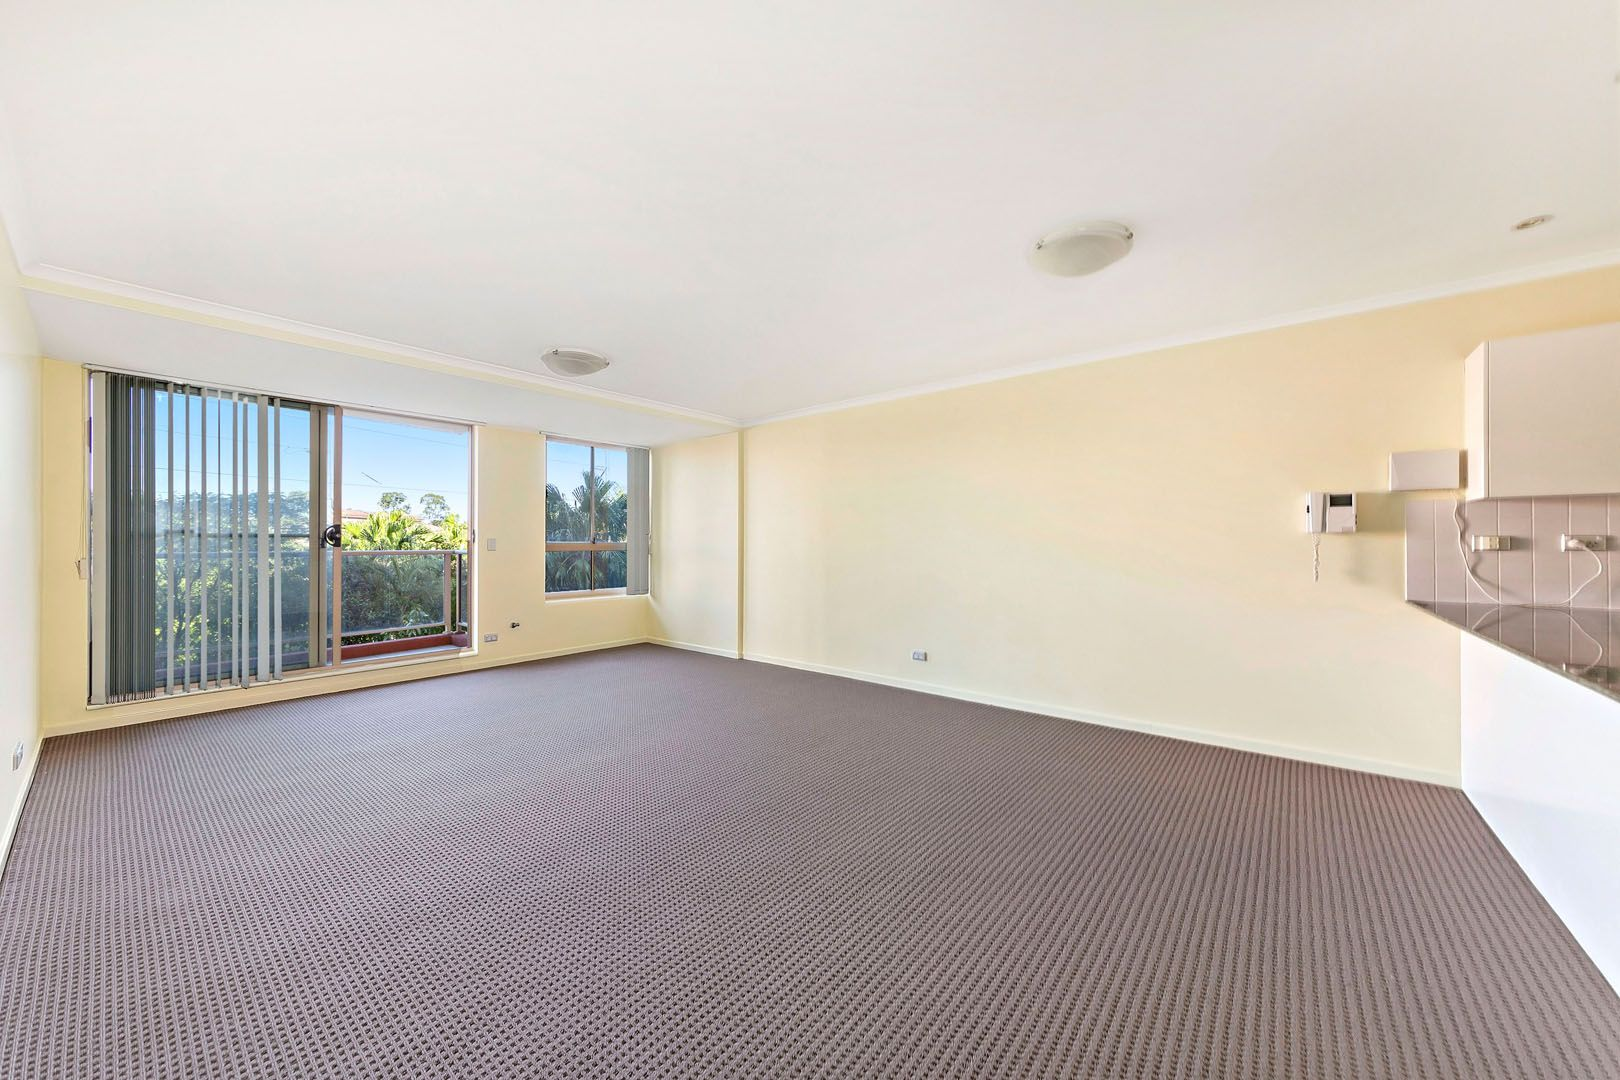 18/14-16 Station Street, Homebush NSW 2140, Image 0